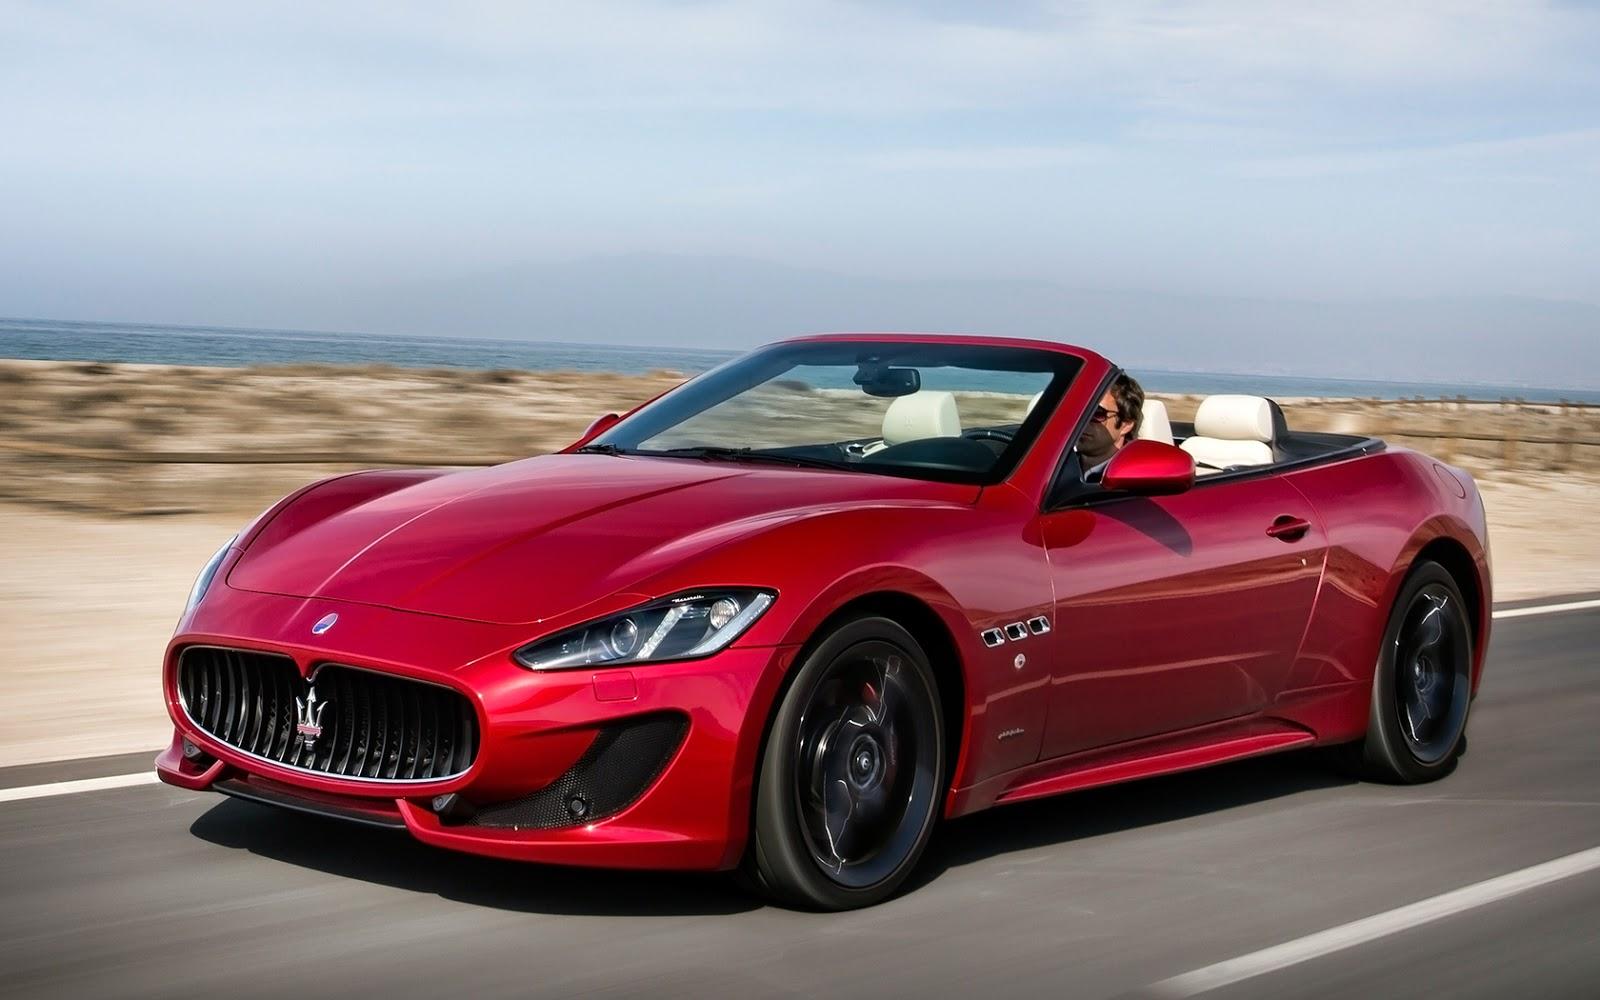 2015 Maserati GranTurismo To Signal New Styling Direction ...